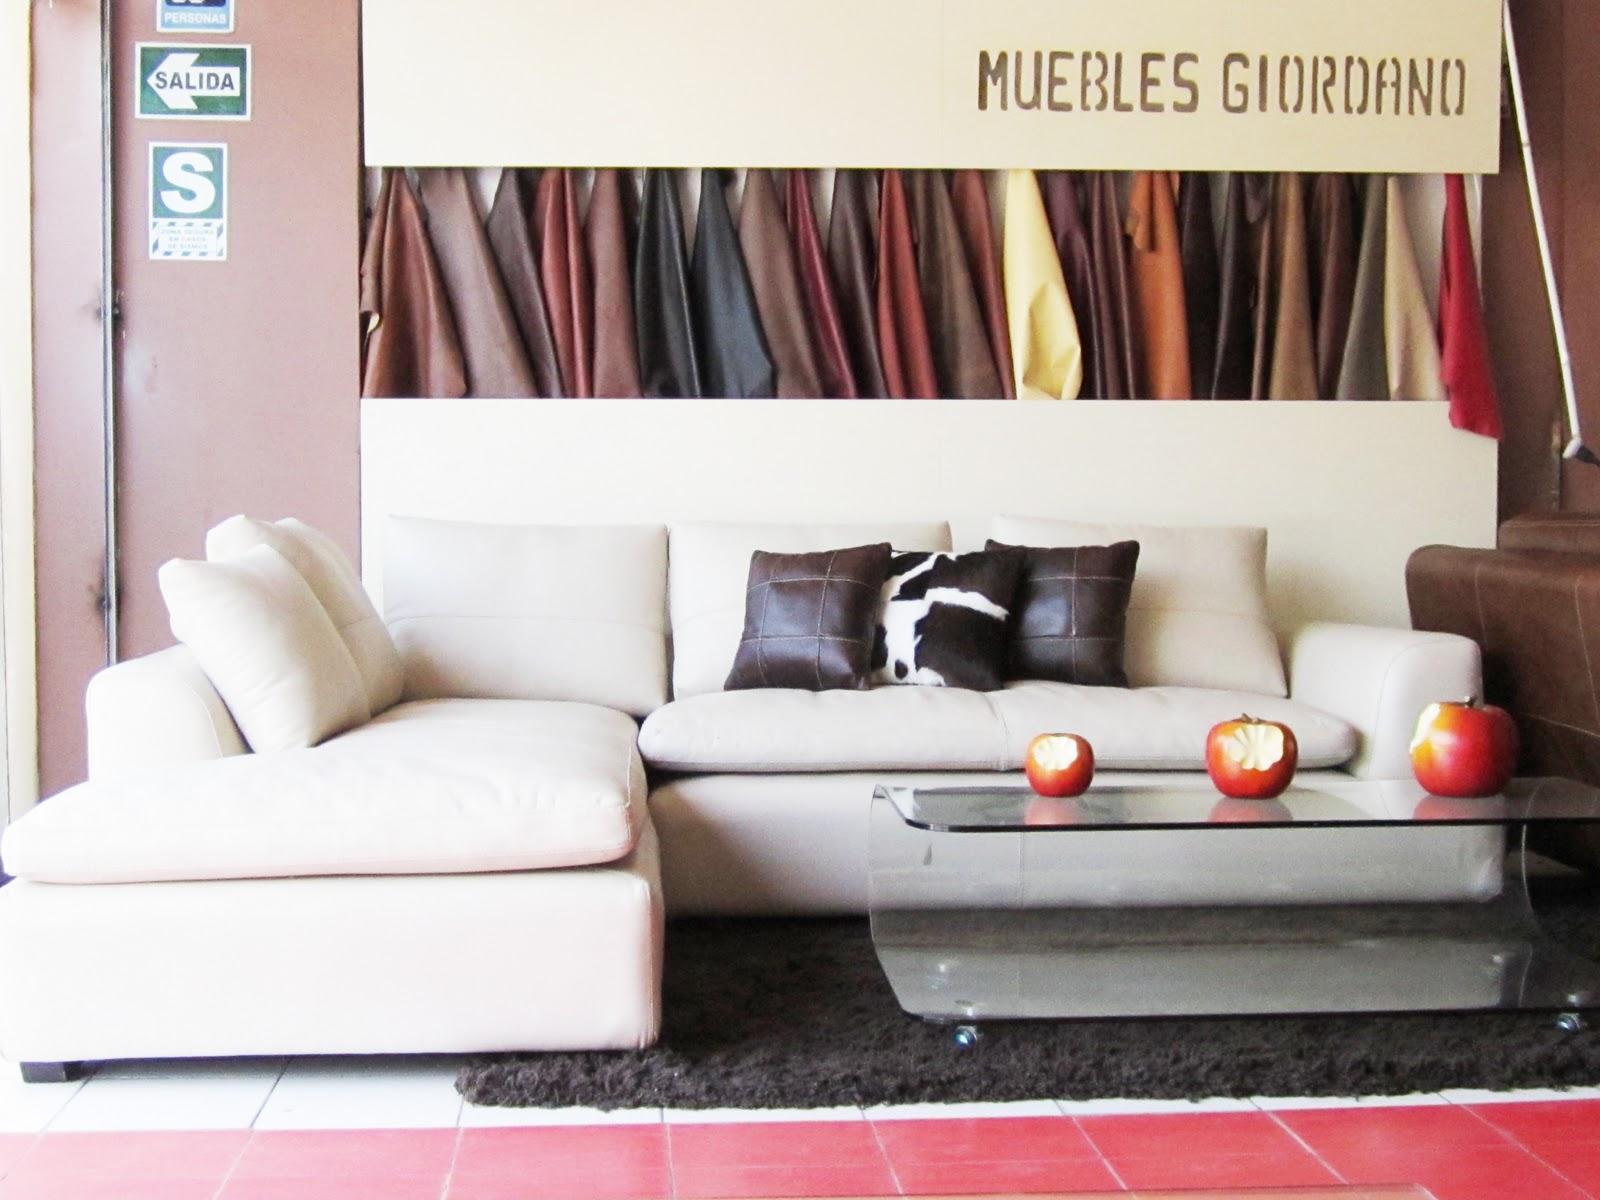 Muebles Giordano Eirl - Muebles Giordano Eirl[mjhdah]http://peruanadeopinionpublica.com/web/images/webimg/562_5_1000.jpg